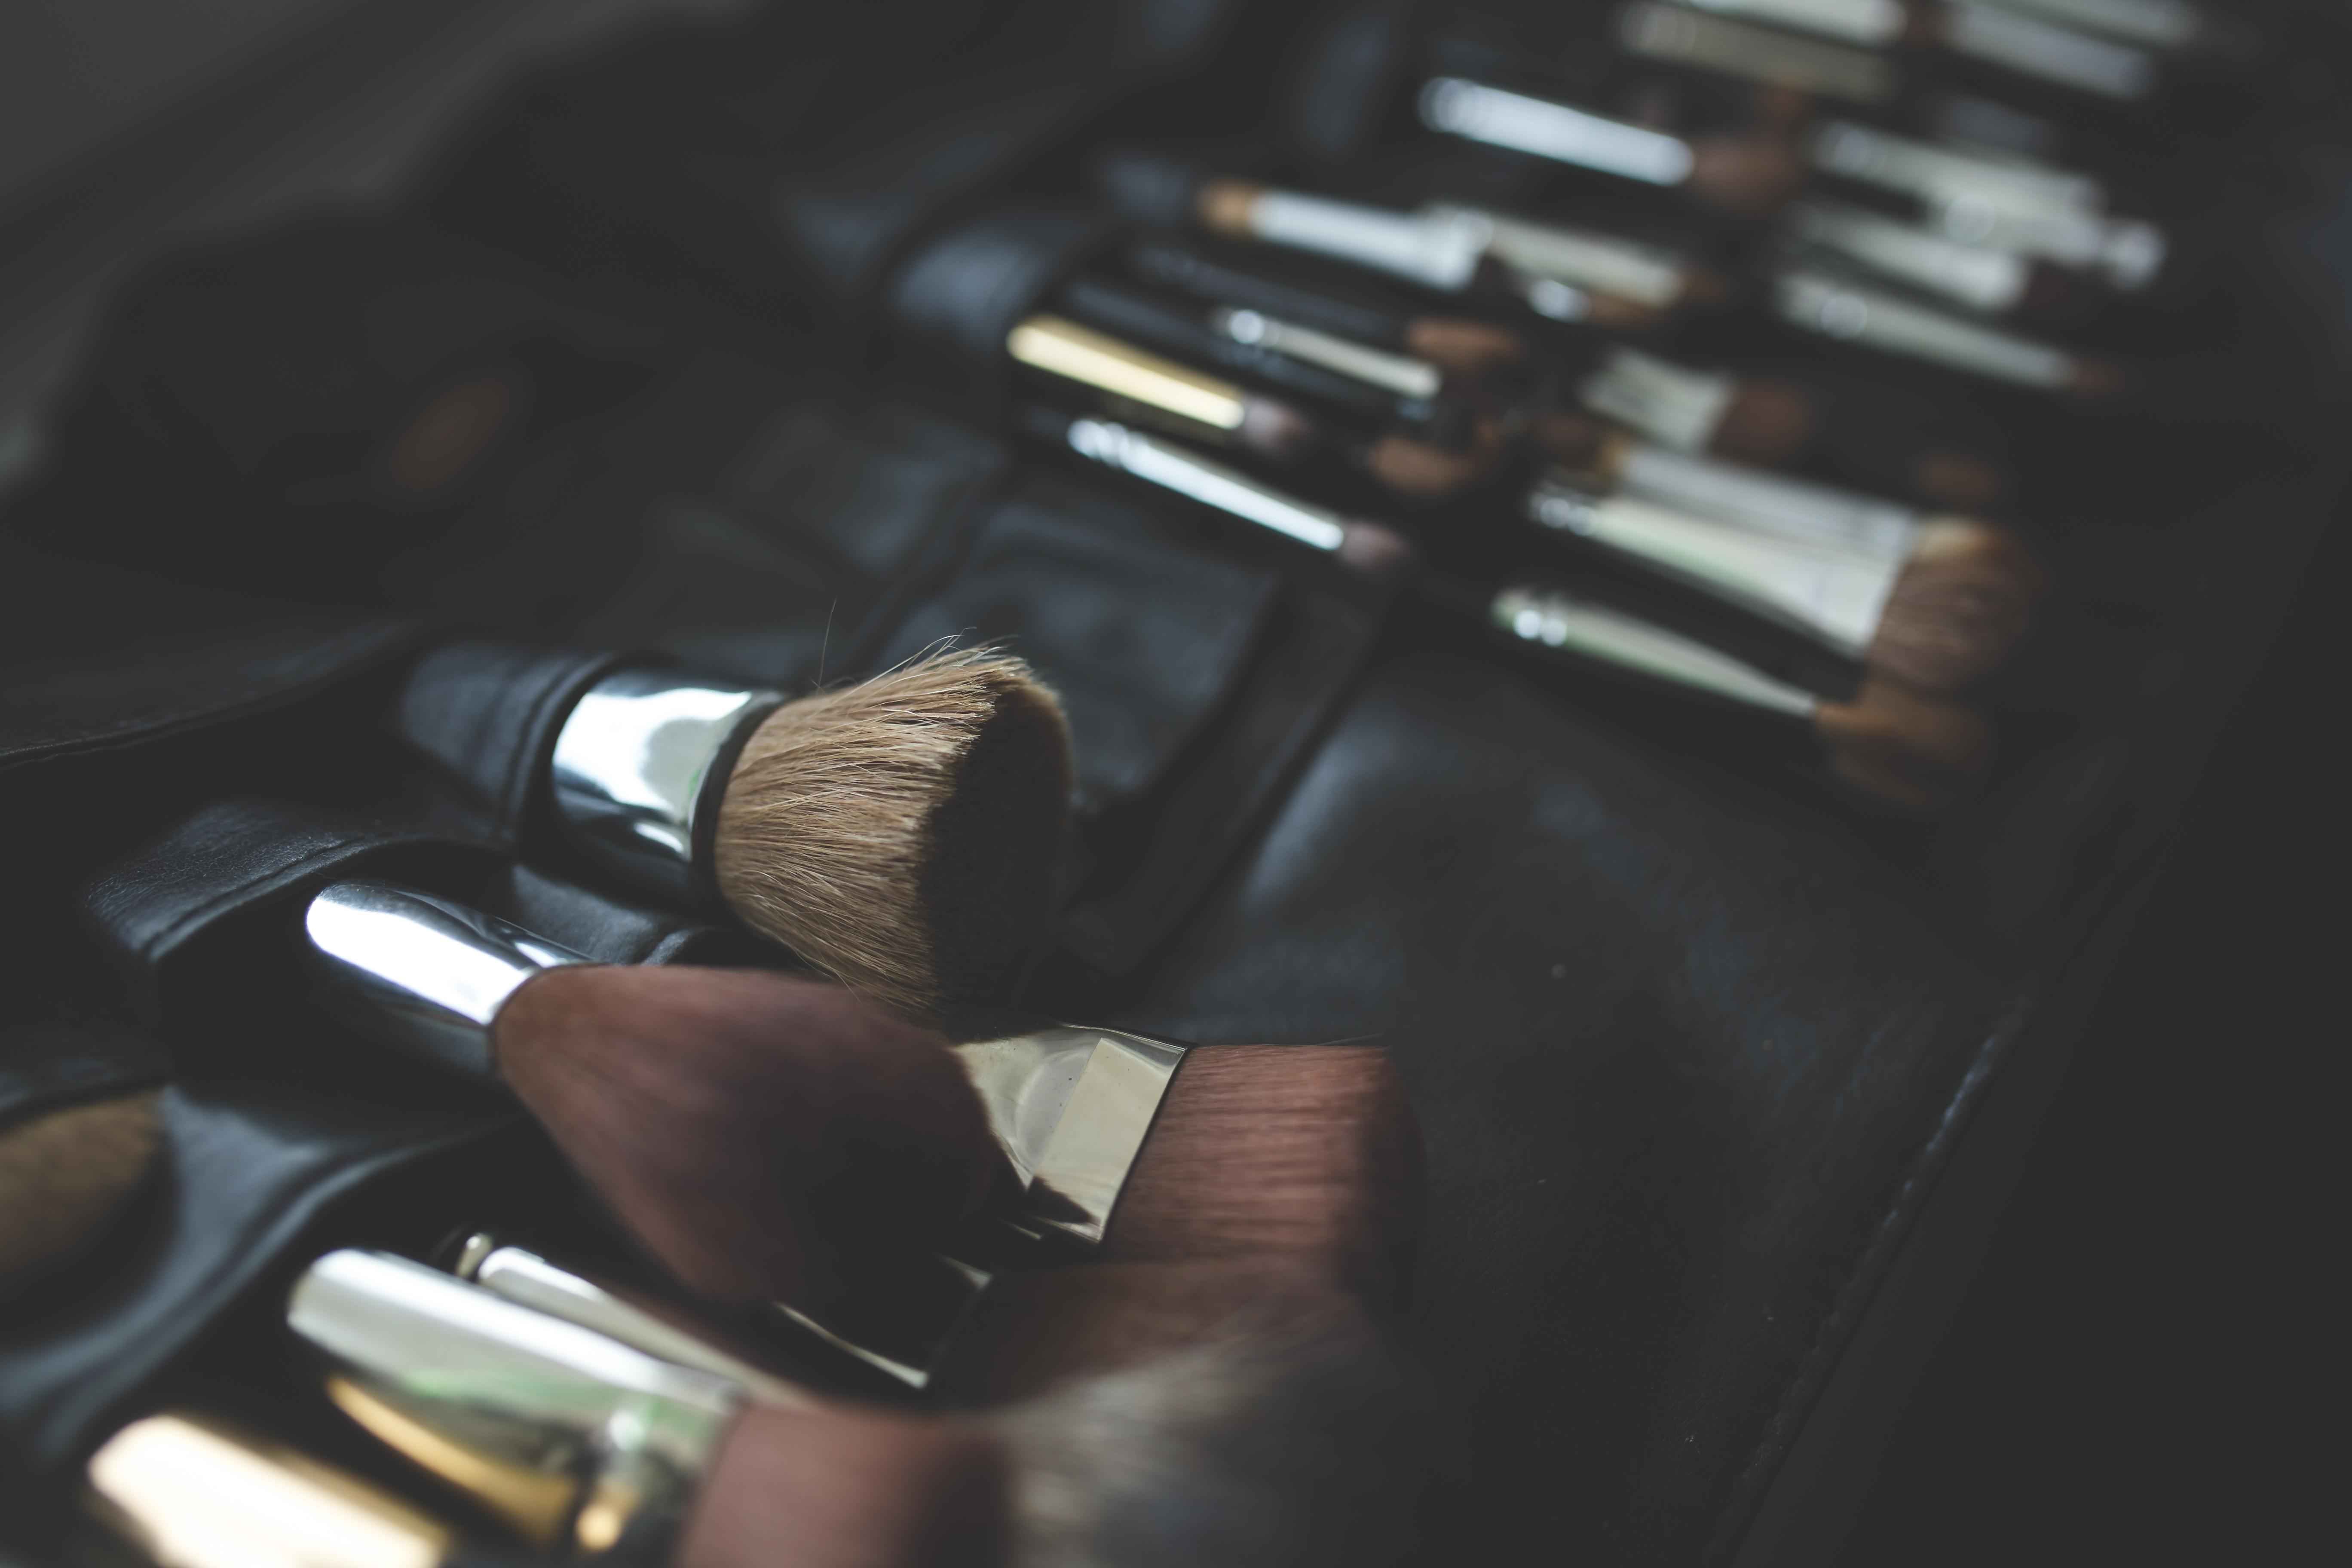 Hand Finger Black Makeup Make Up Close Eye Organ Brushes Firearm